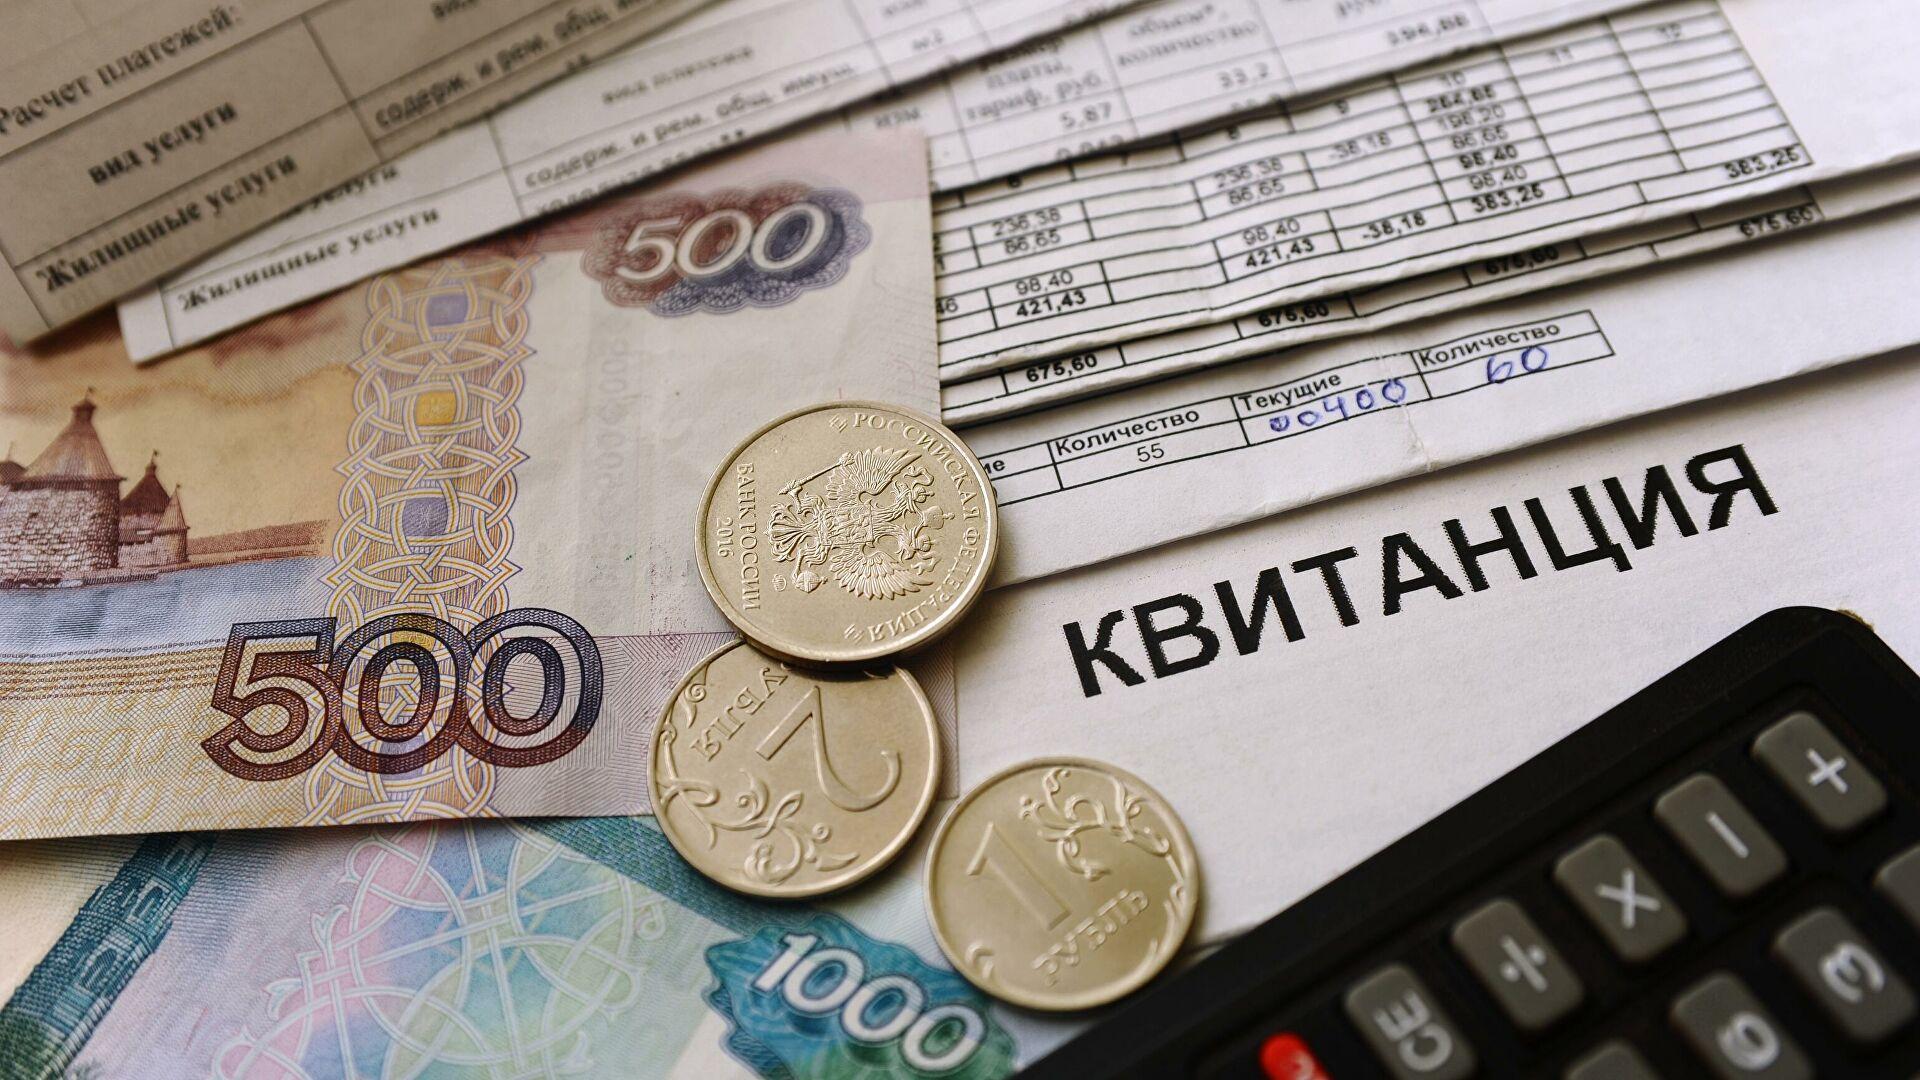 За 4 месяца в регионе похитили 20 миллионов рублей в сфере ЖКХ